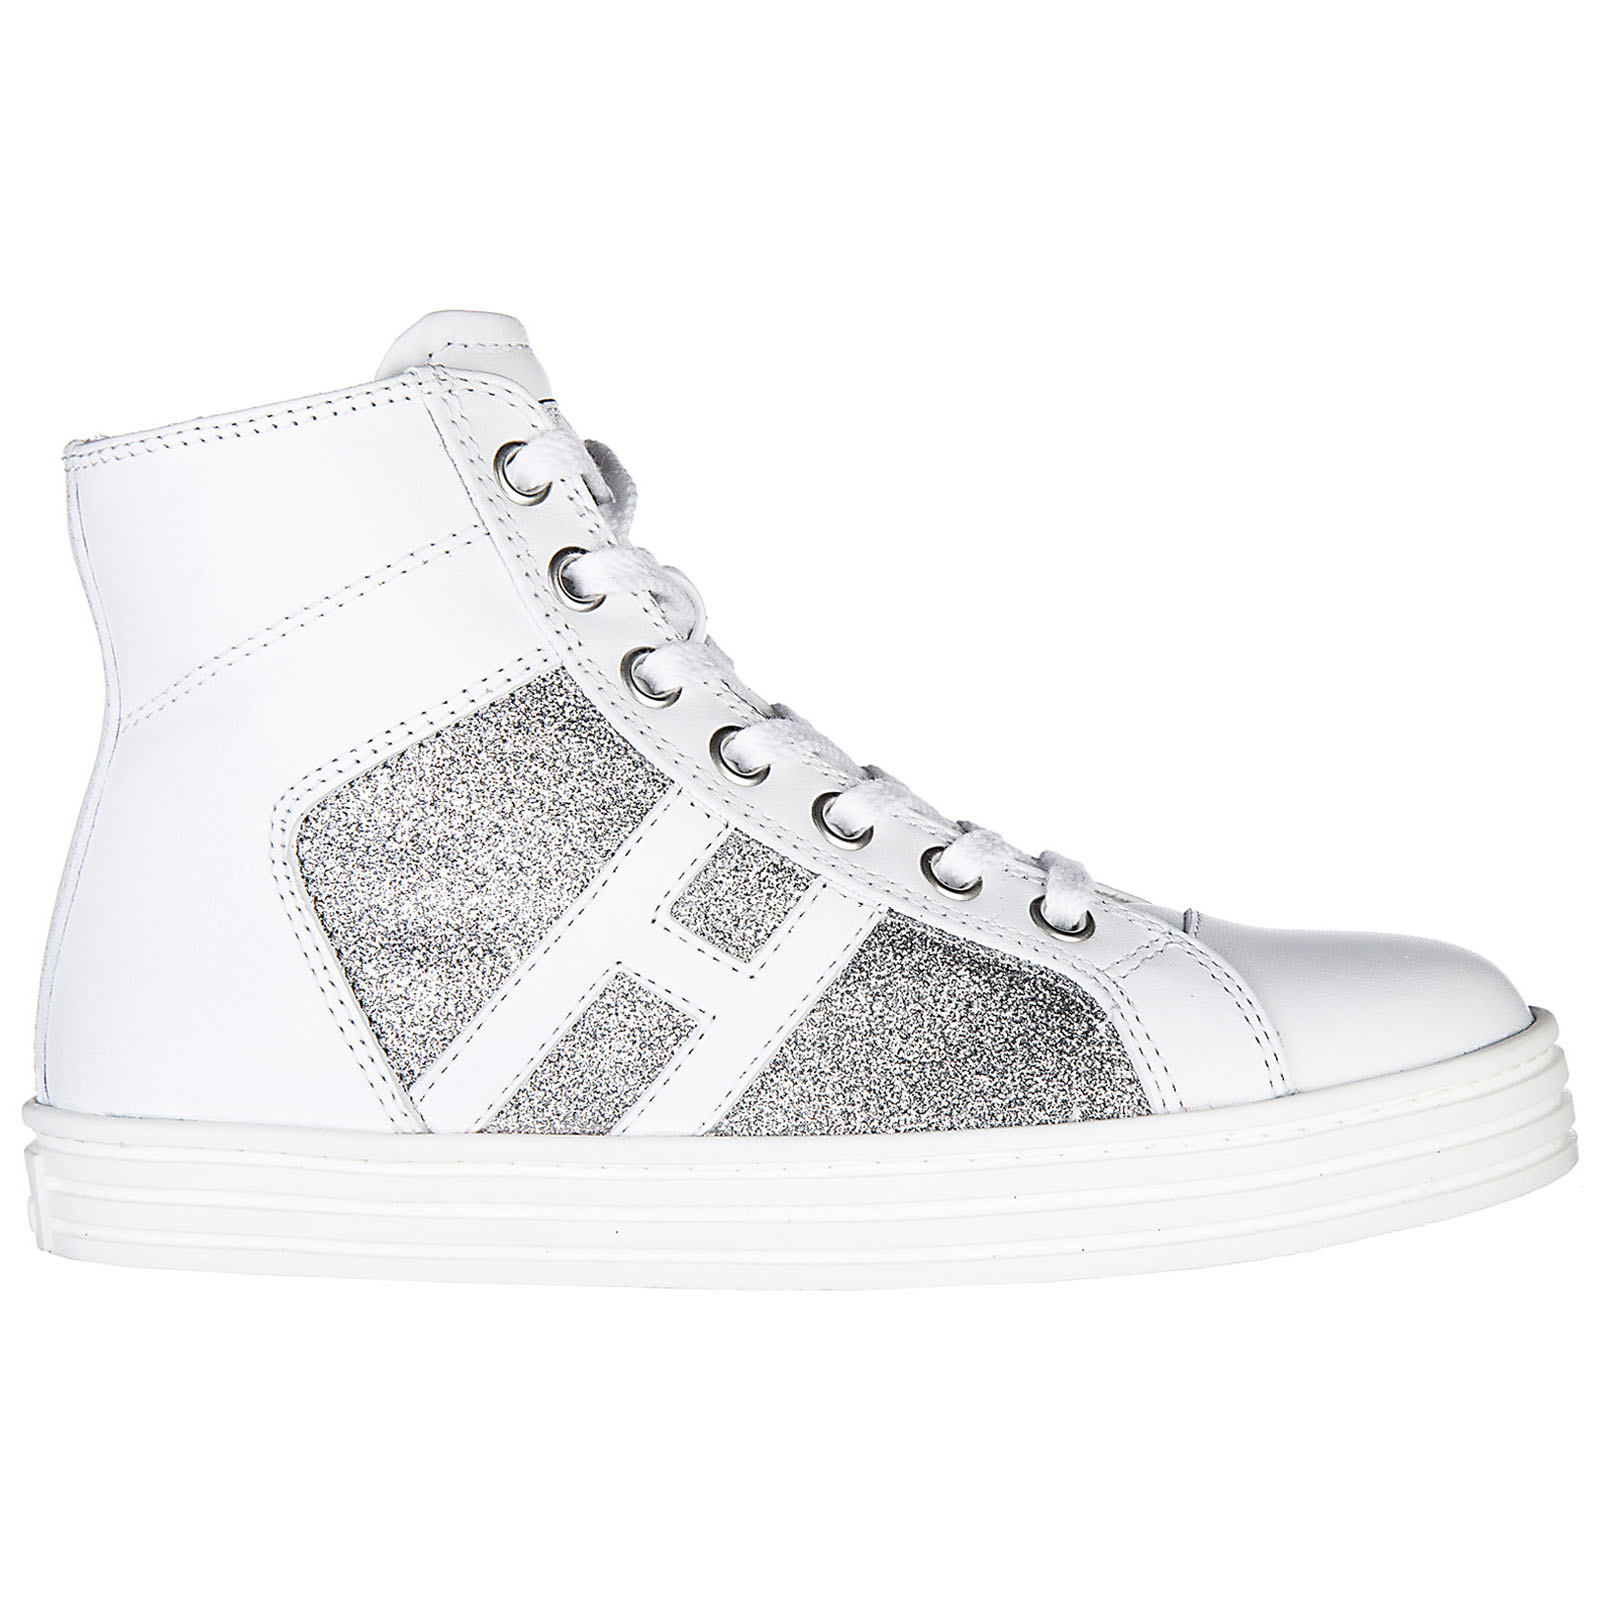 58.00€. hogan rebel scarpe sneakers bimba bambina ... e4a0df789c3